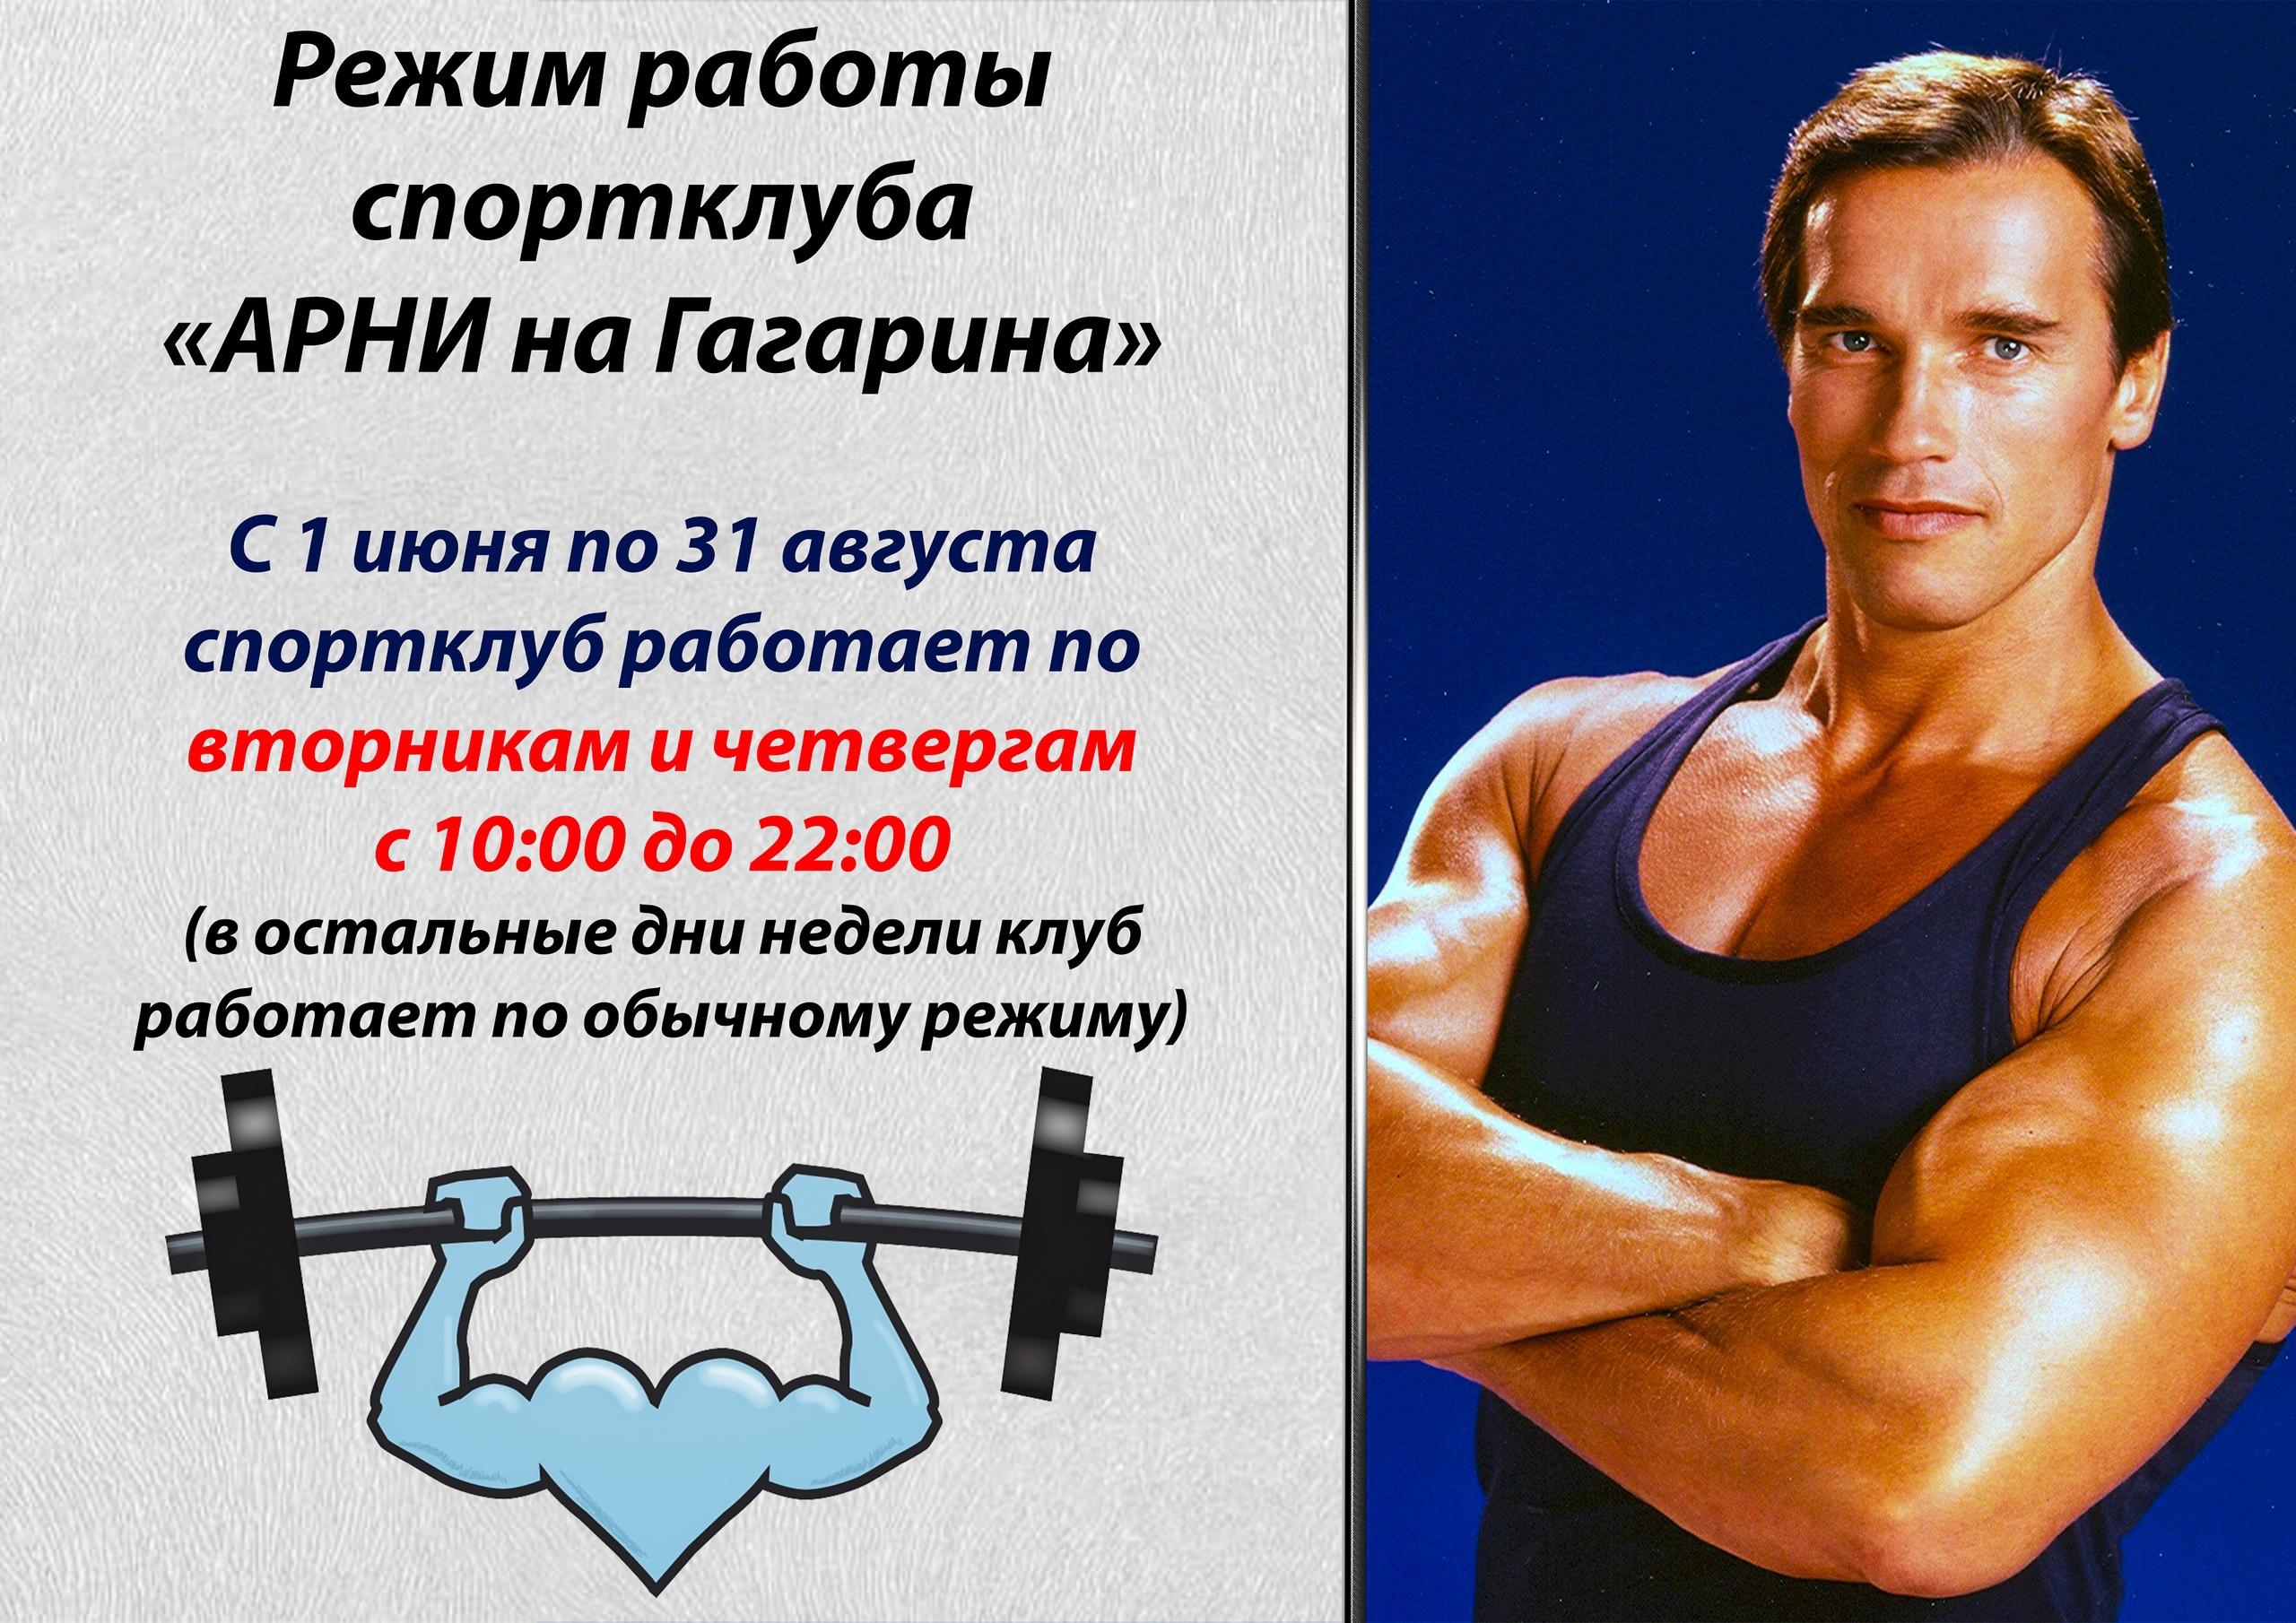 12-11-47-QUyBnHmzmC8